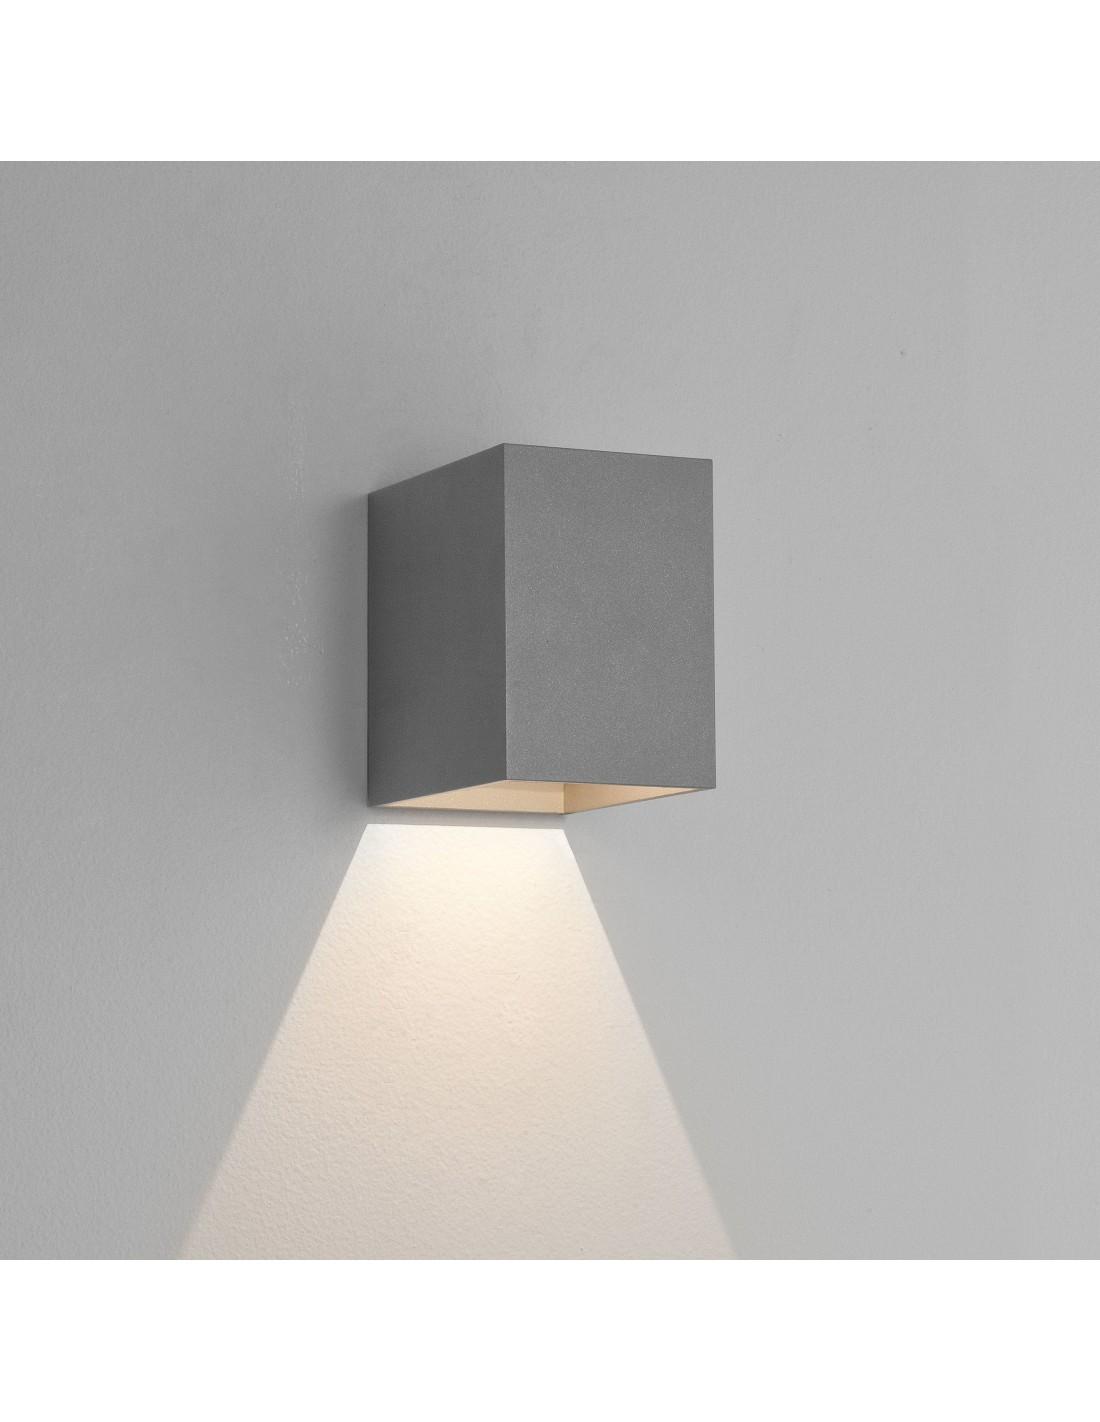 Applique Oslo 100 LED gris Astro lighting - Valente Design